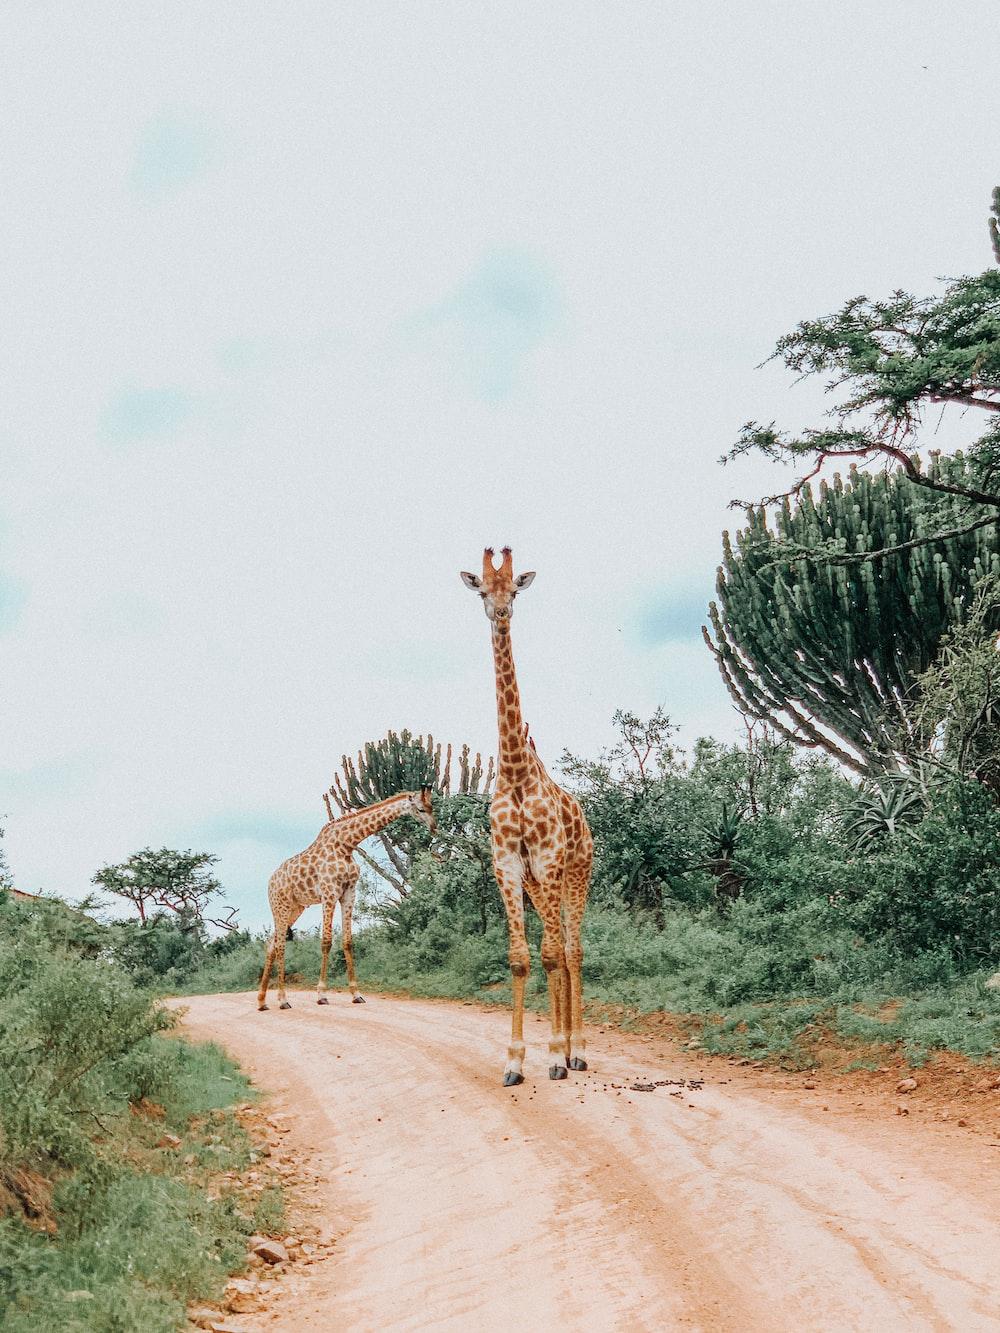 giraffe standing on brown dirt road during daytime